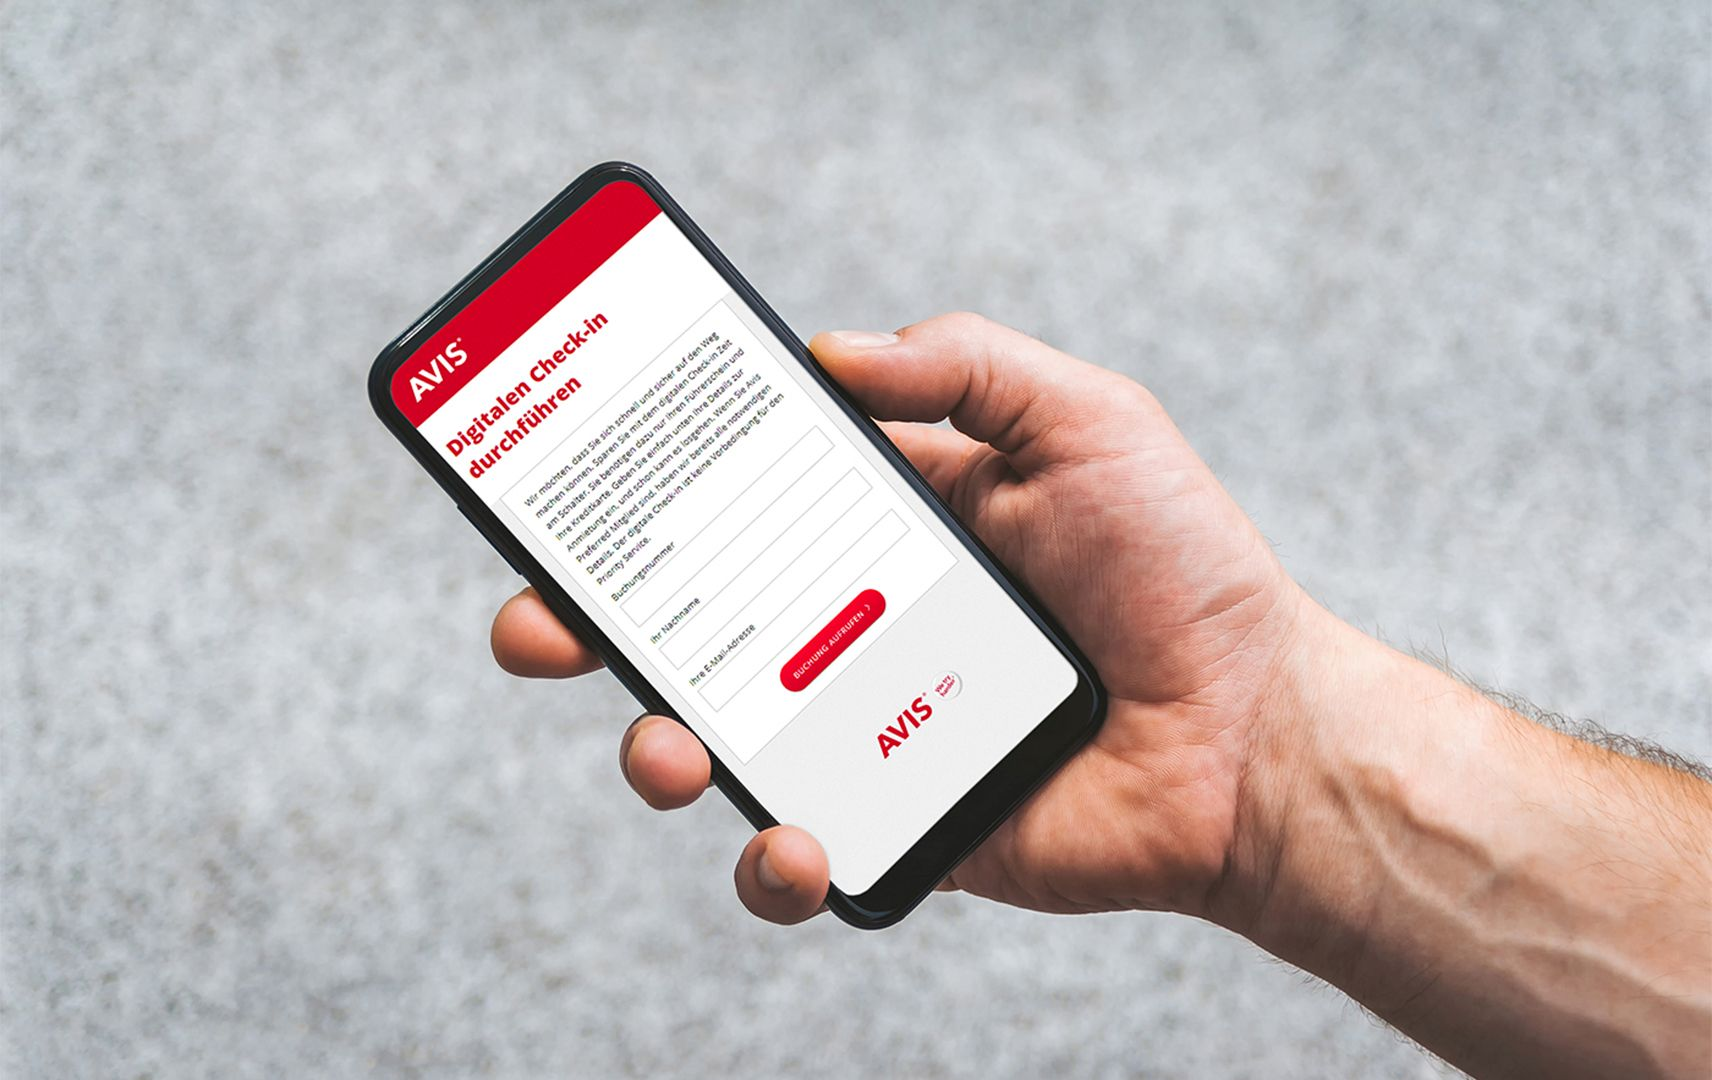 Avis Smartphone Screen Digitaler Check-in